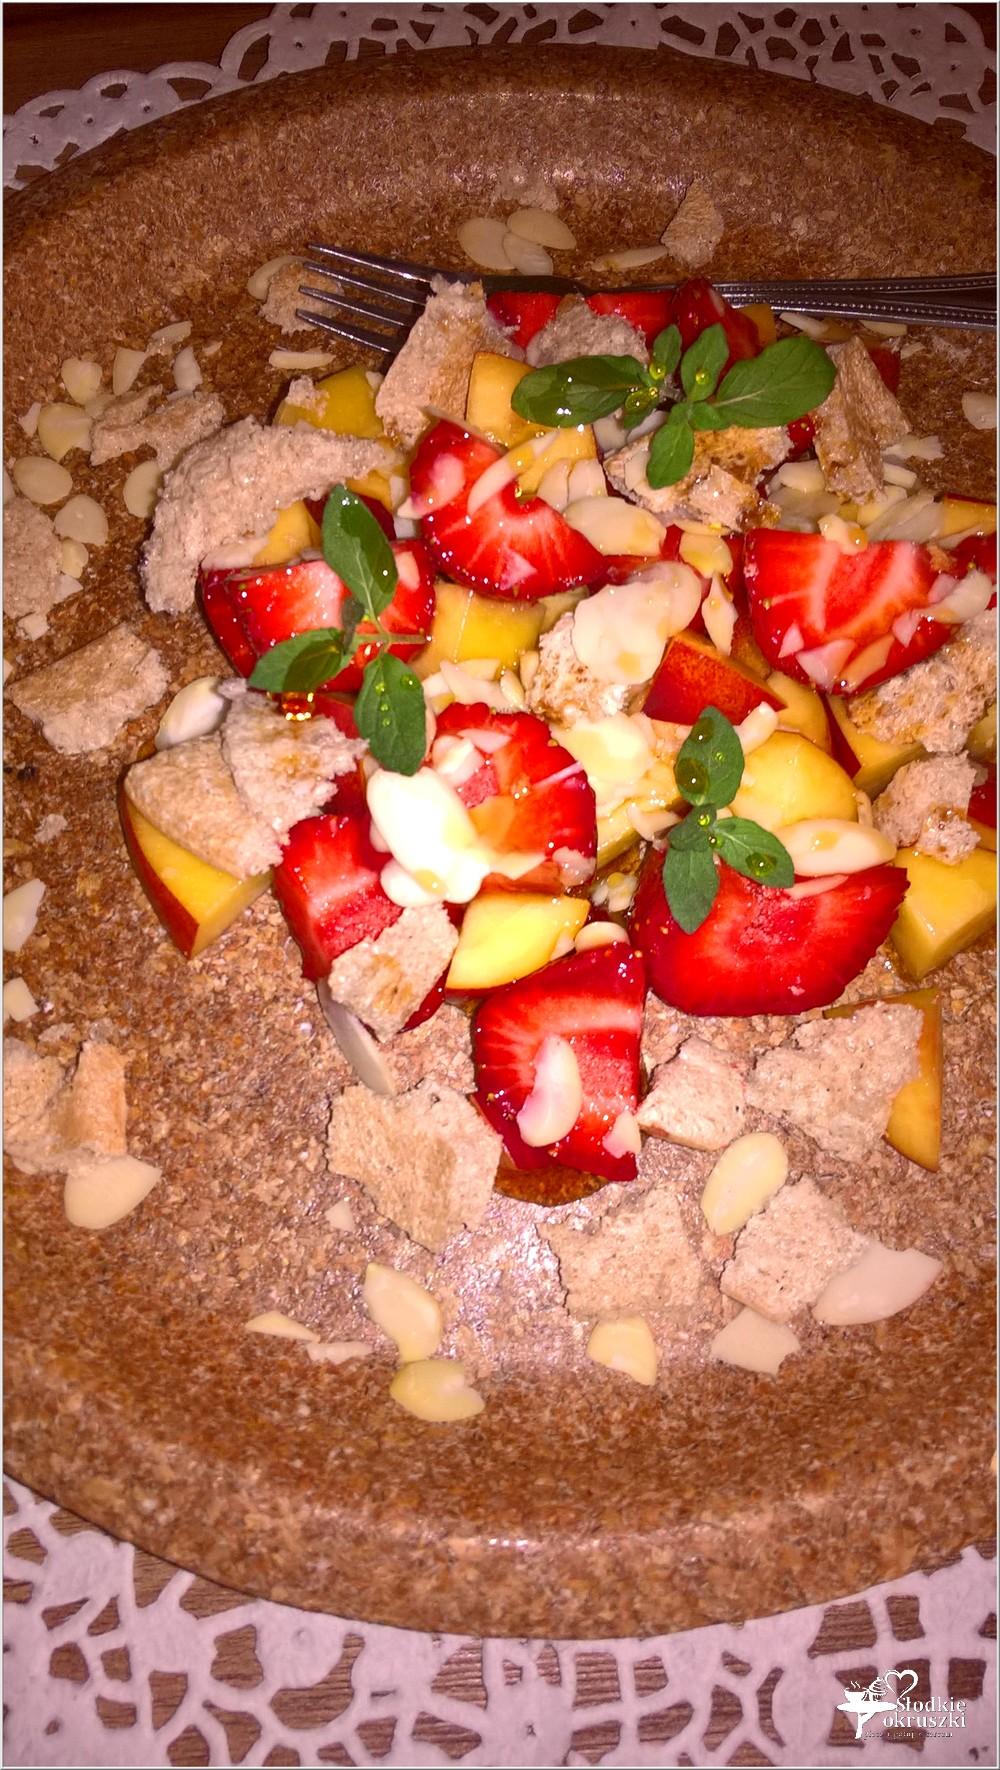 Letni deser owocowy z syropem klonowym (1)